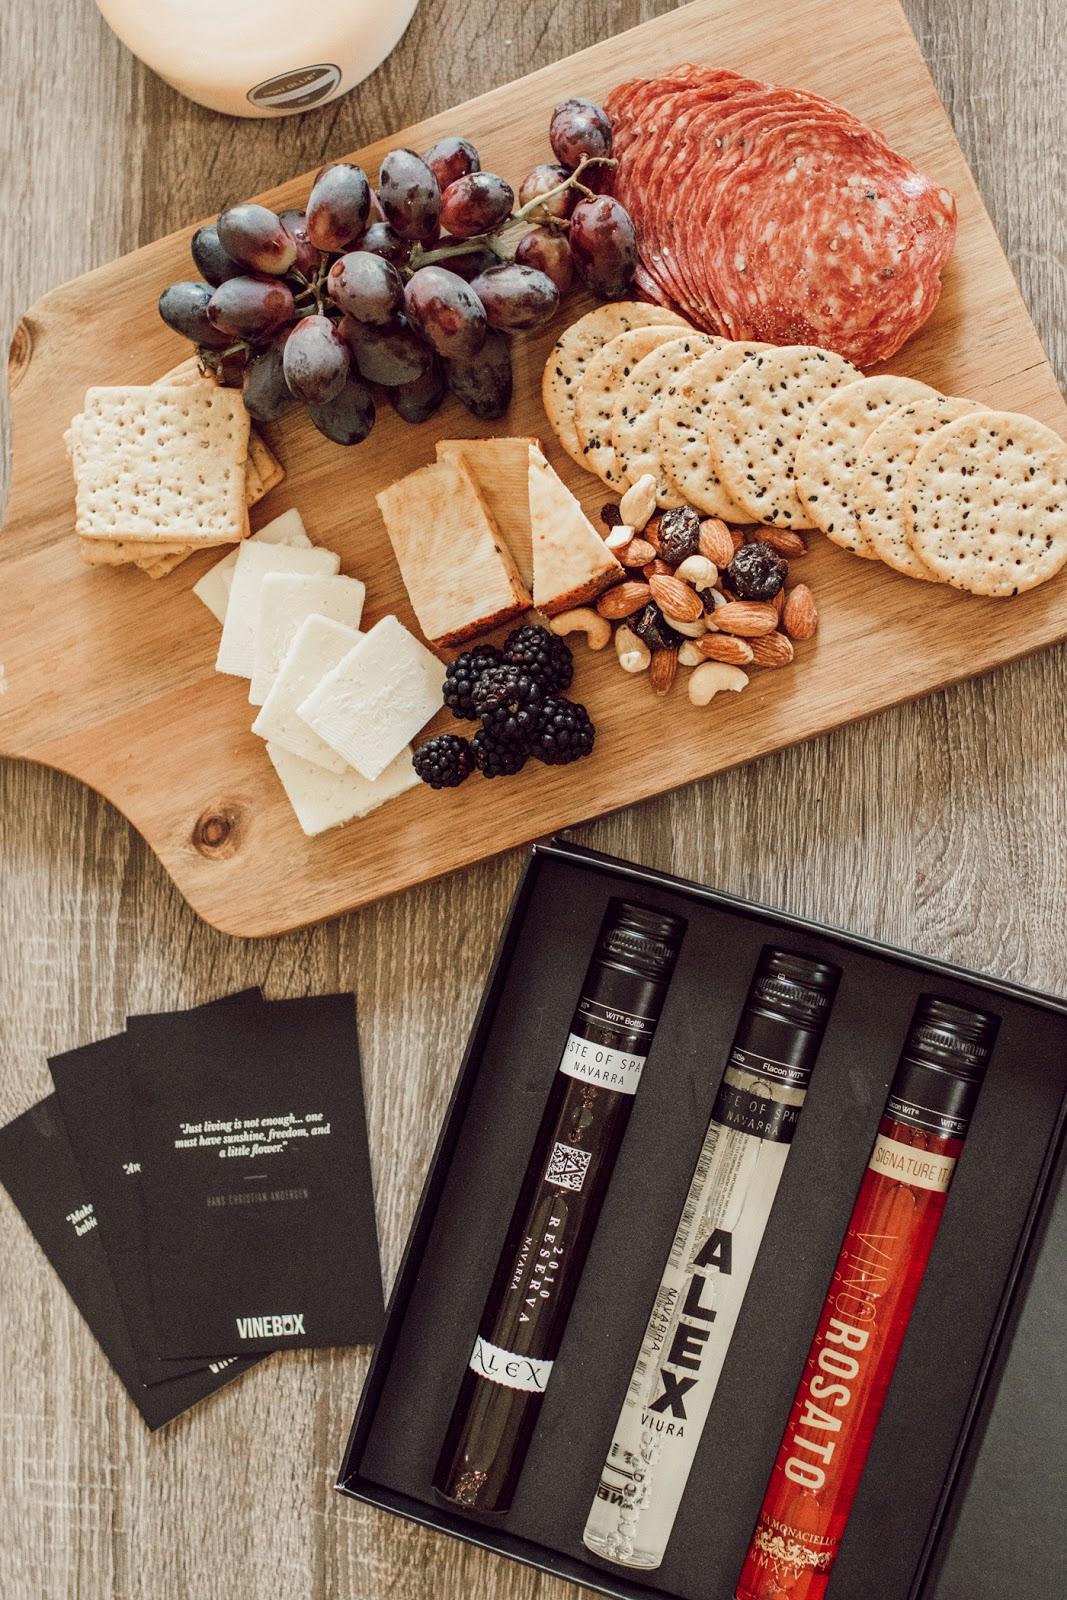 Charcuterie board + wine tasting